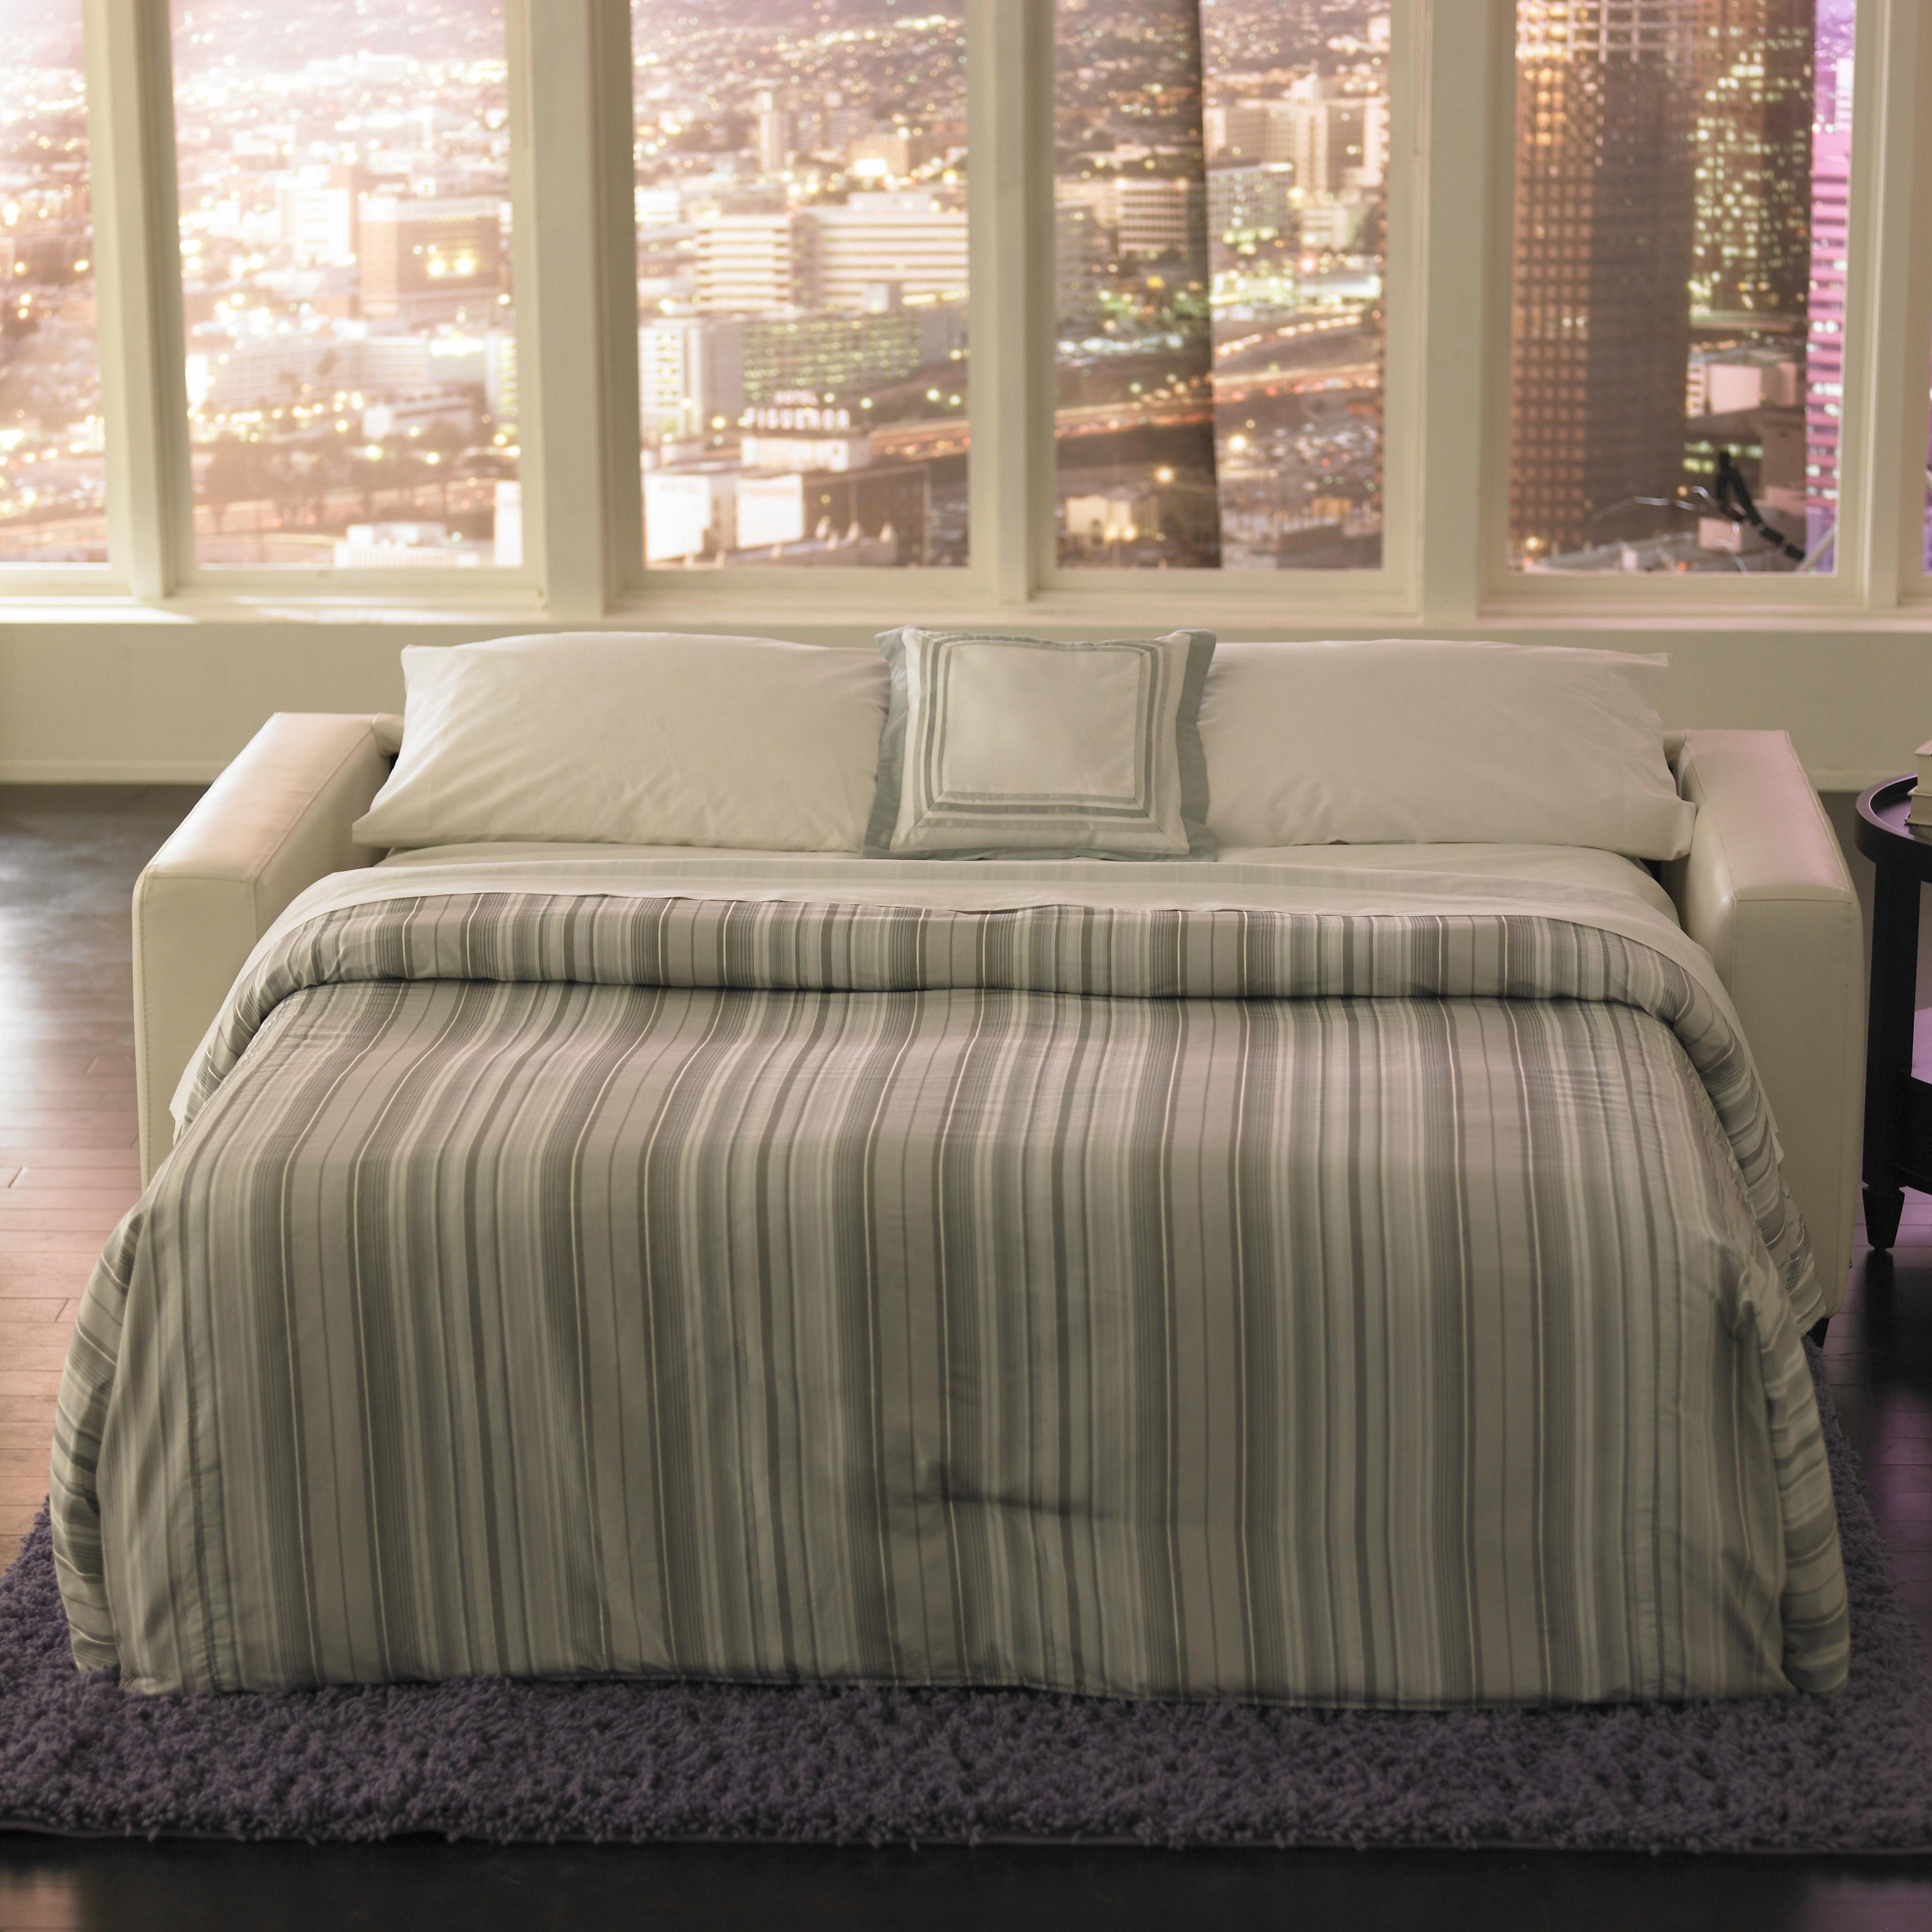 B534 Sleeper Sofa by Natuzzi Editions at Williams & Kay